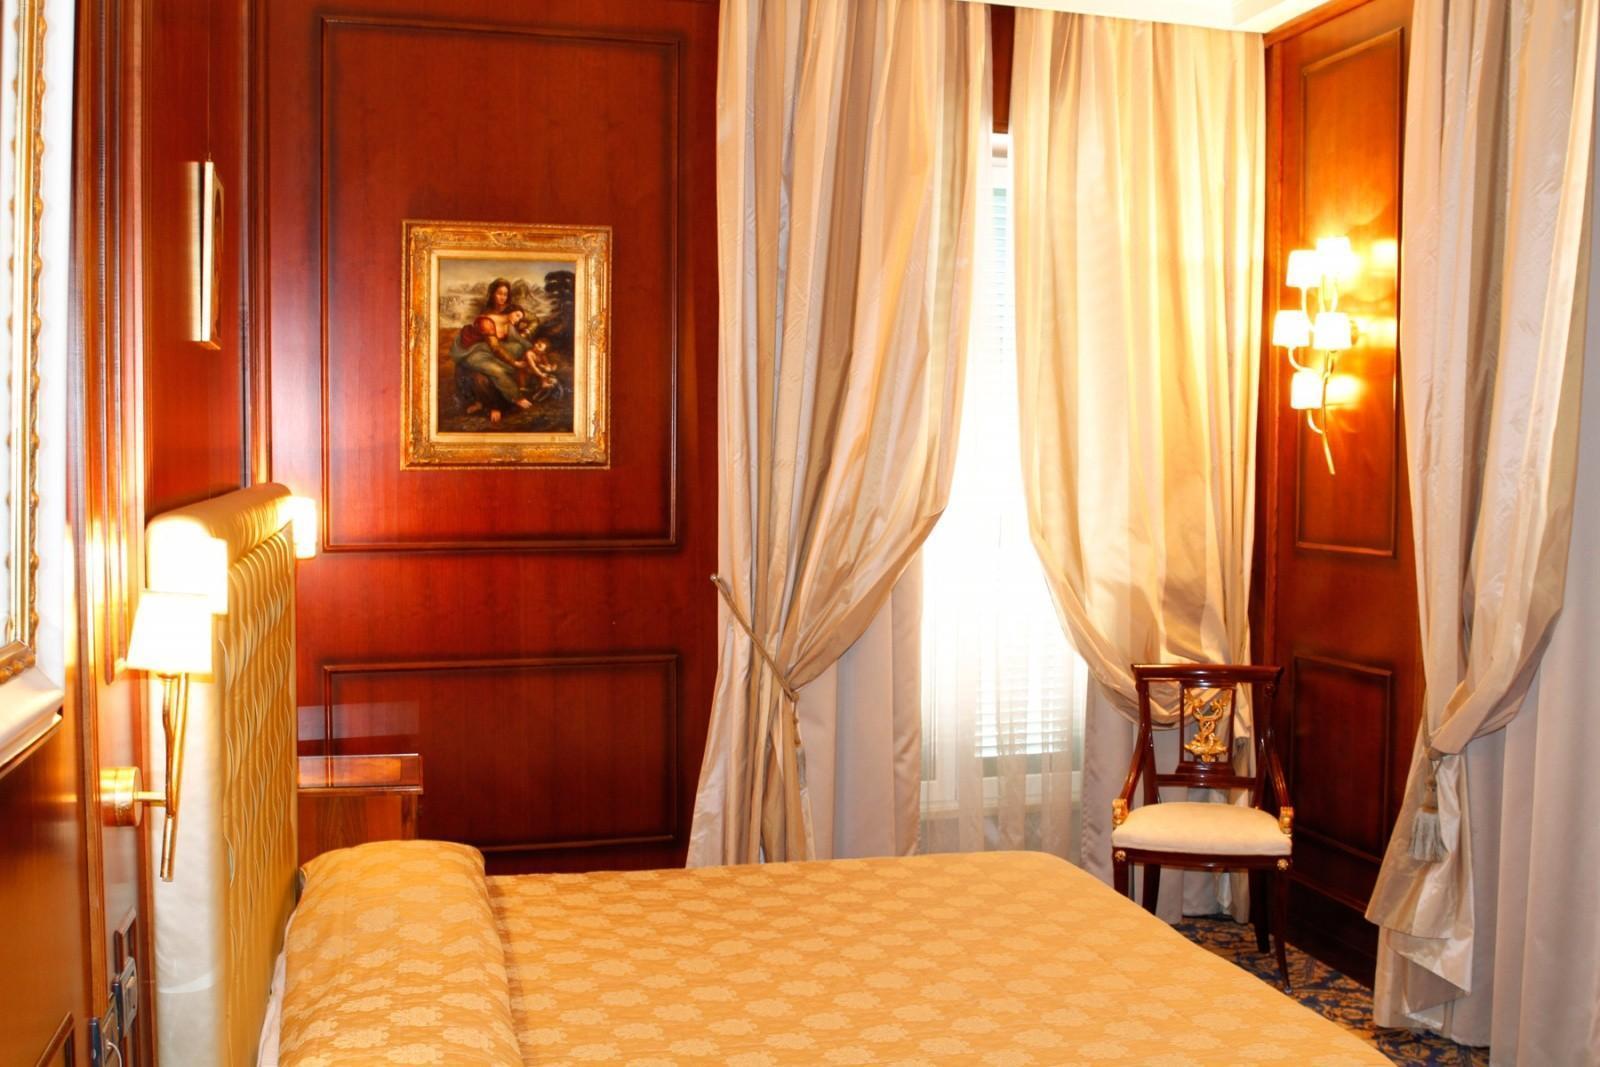 Boutique hotel trevi rome italy book boutique hotel for Boutique hotels italy